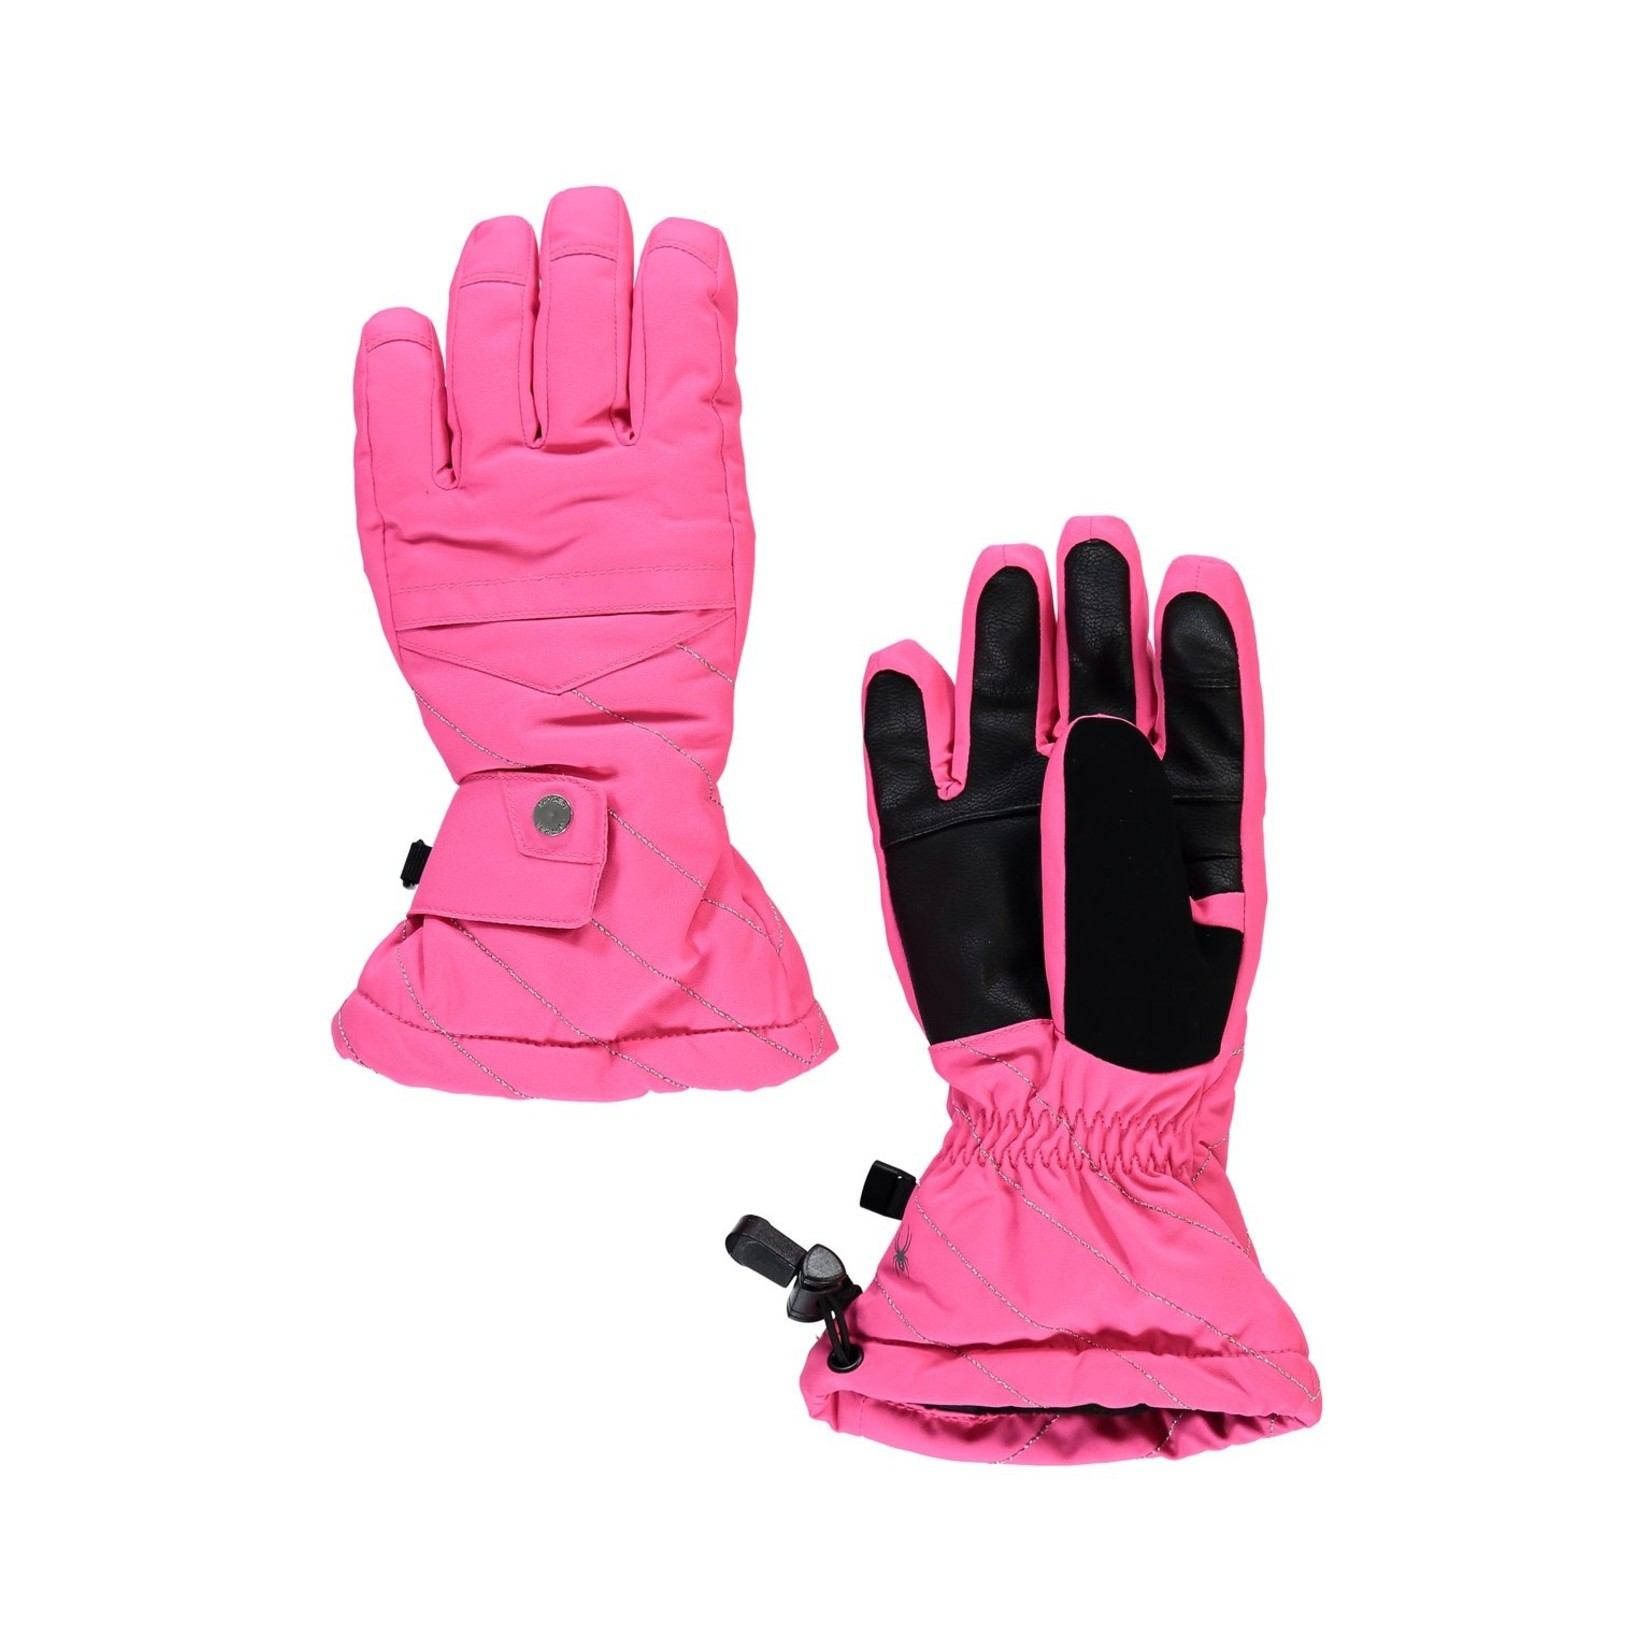 Spyder Spyder Girls Synthesis Ski Glove